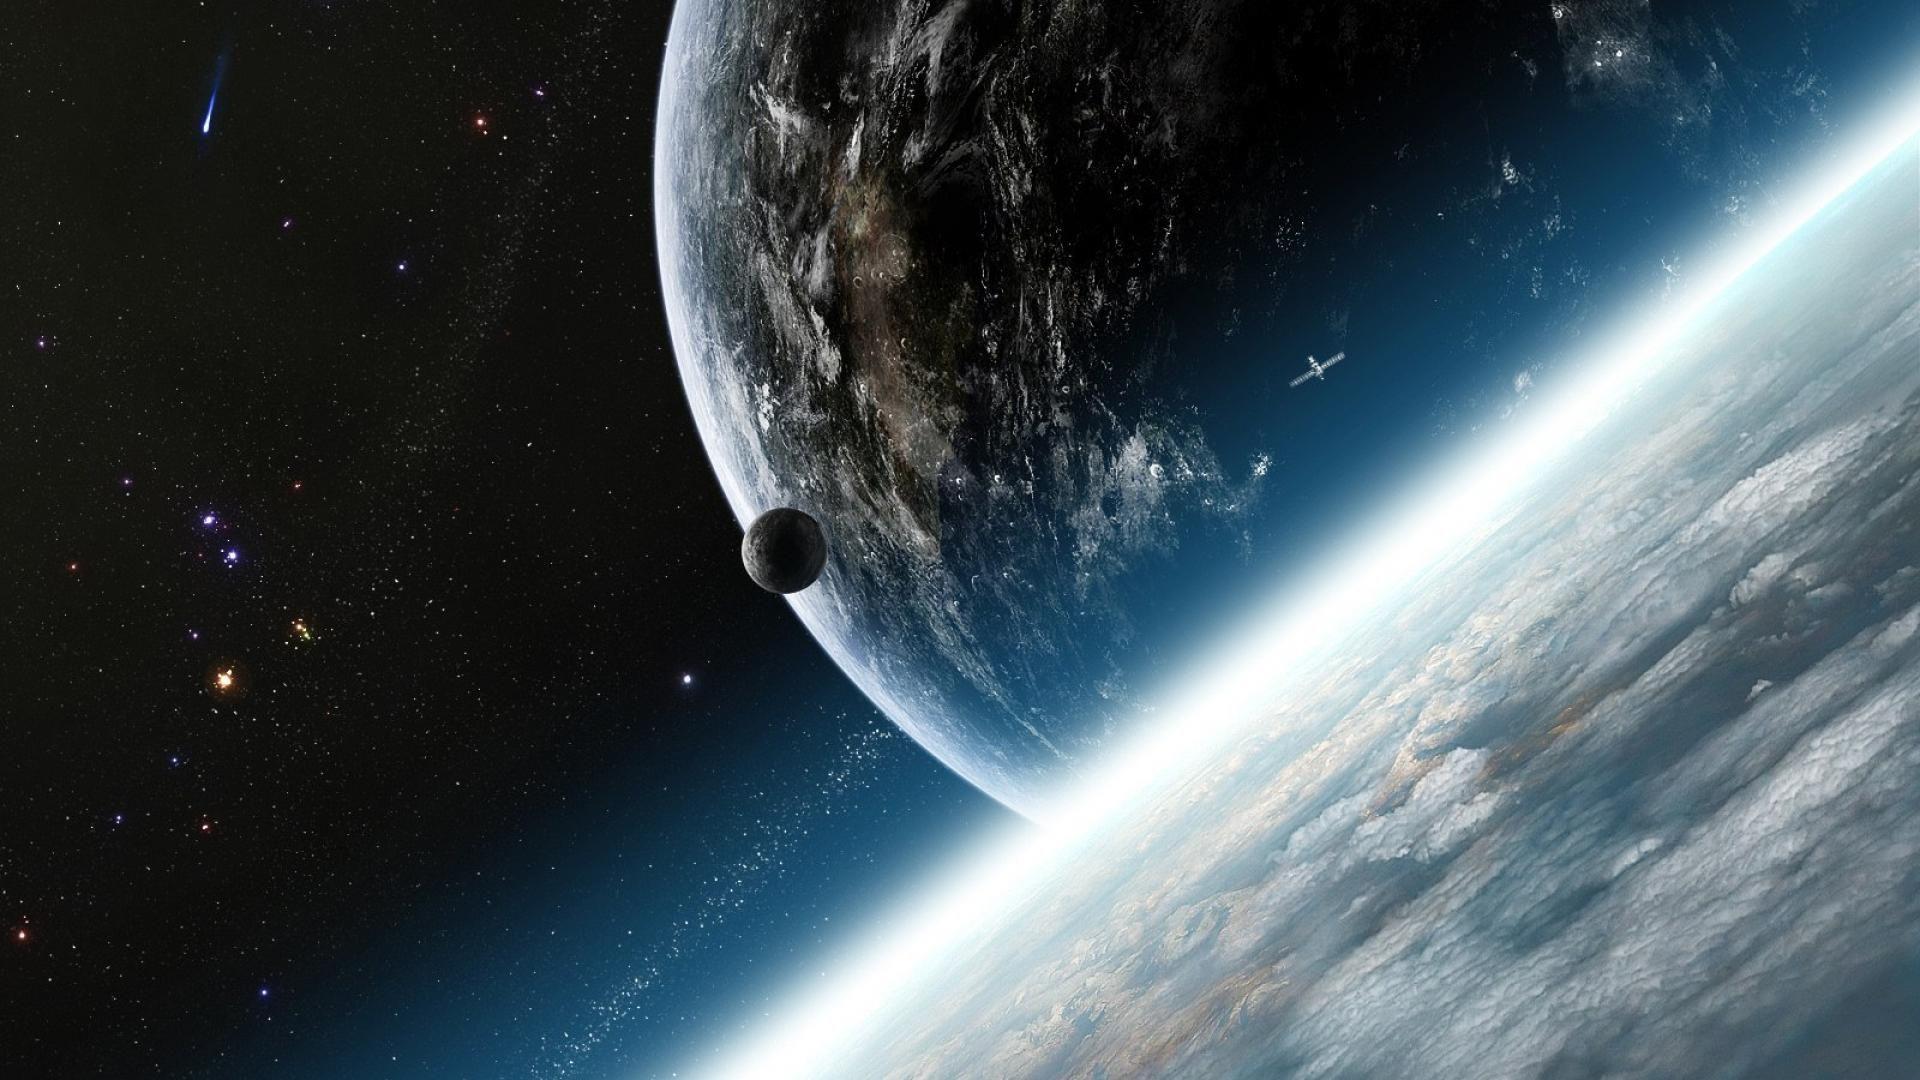 Free Sci Fi Fantasy Desktop Wallpaper: Desktop Wallpaper Science Fiction Theme